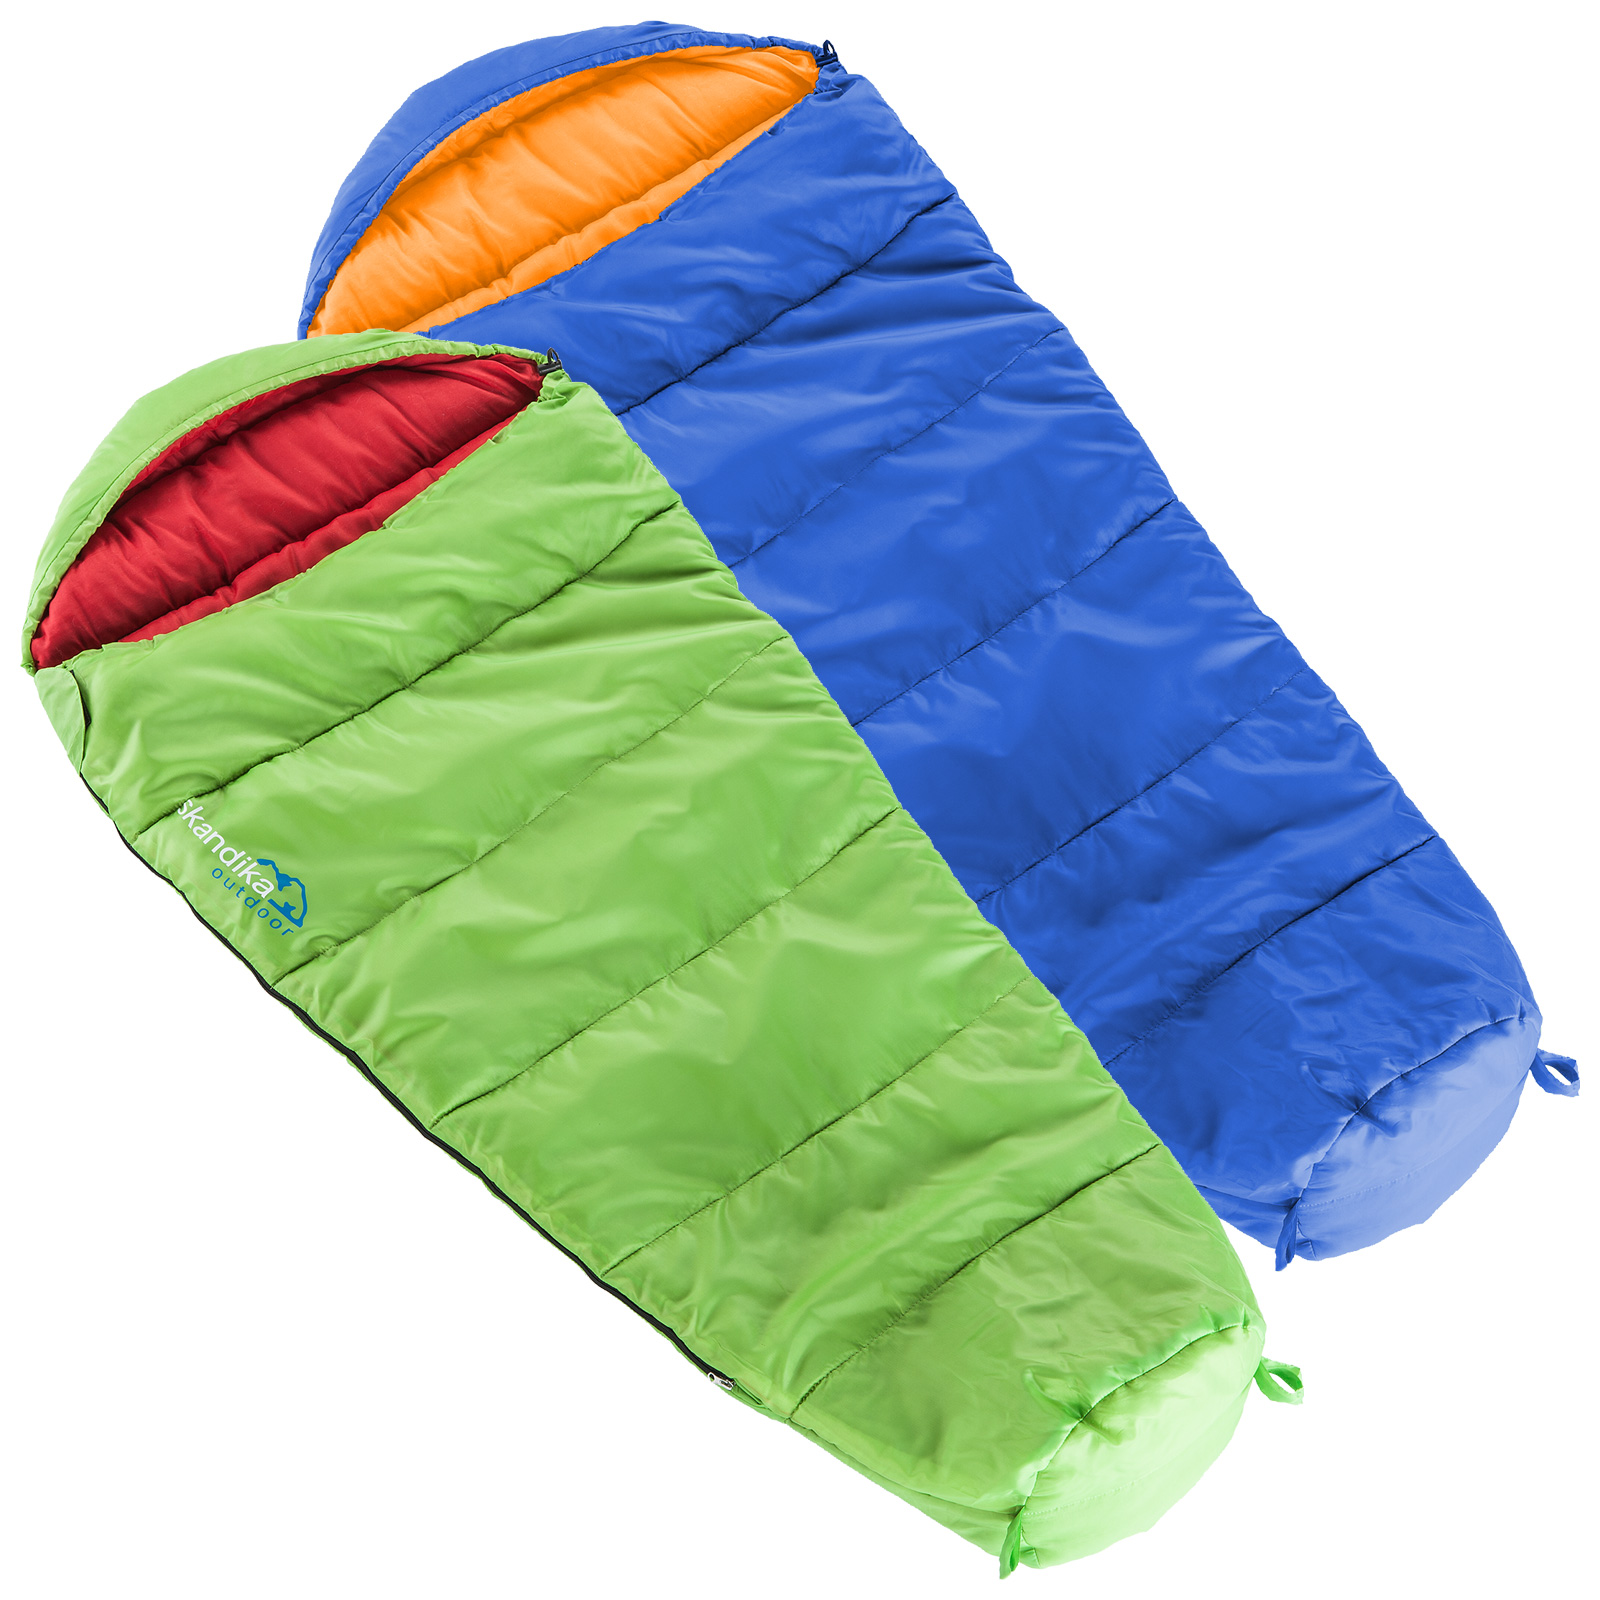 skandika vegas camping mumien schlafsack erwachsene. Black Bedroom Furniture Sets. Home Design Ideas